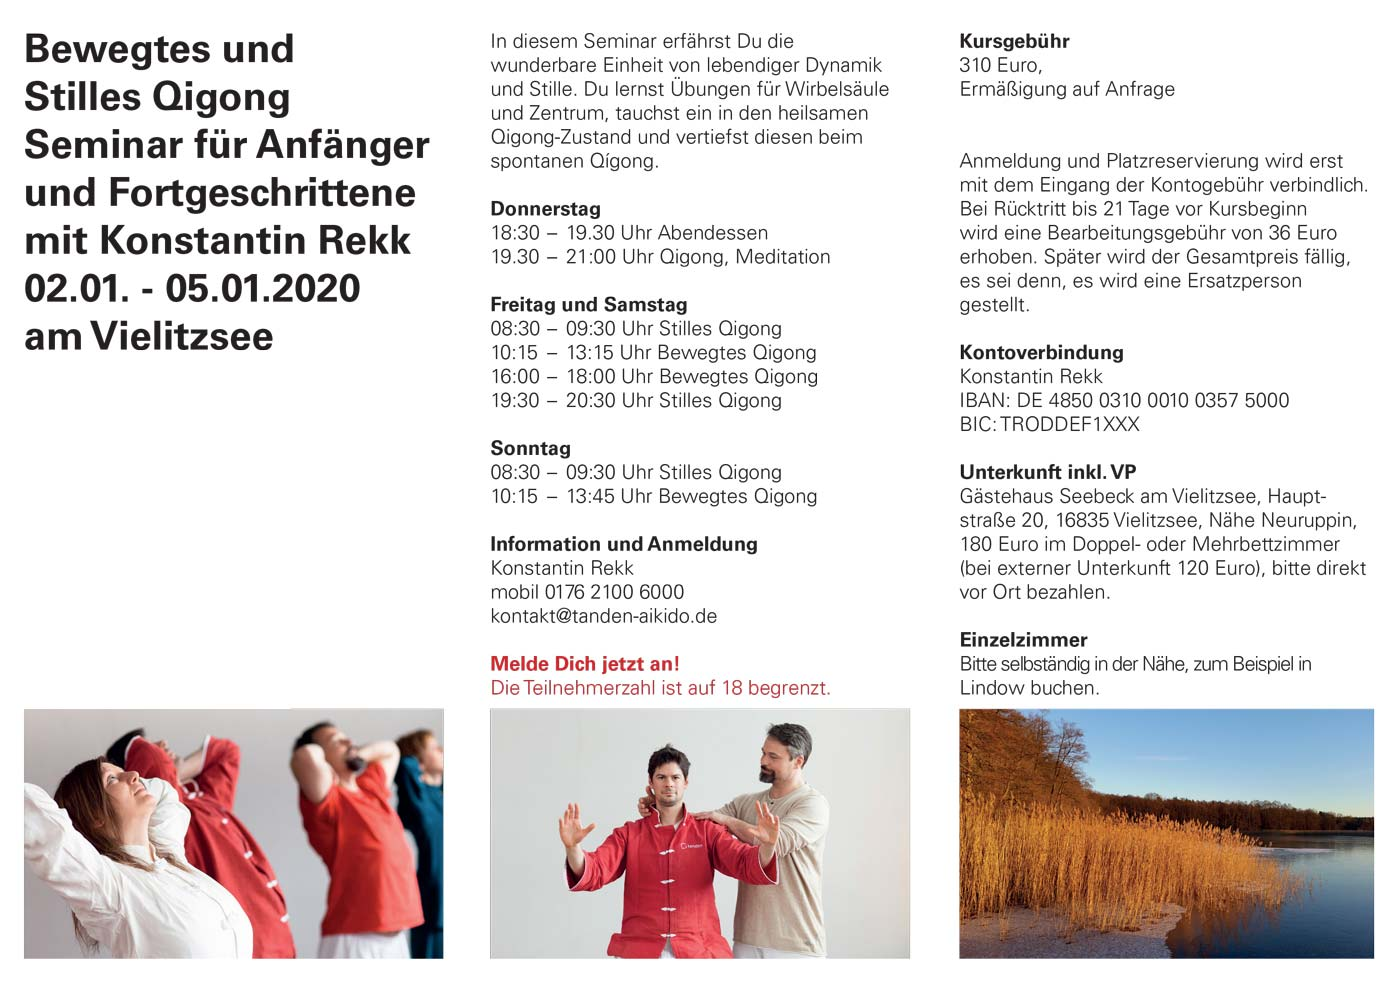 Qigong Seminar am Vielitzsee, Neujahr Januar 2020